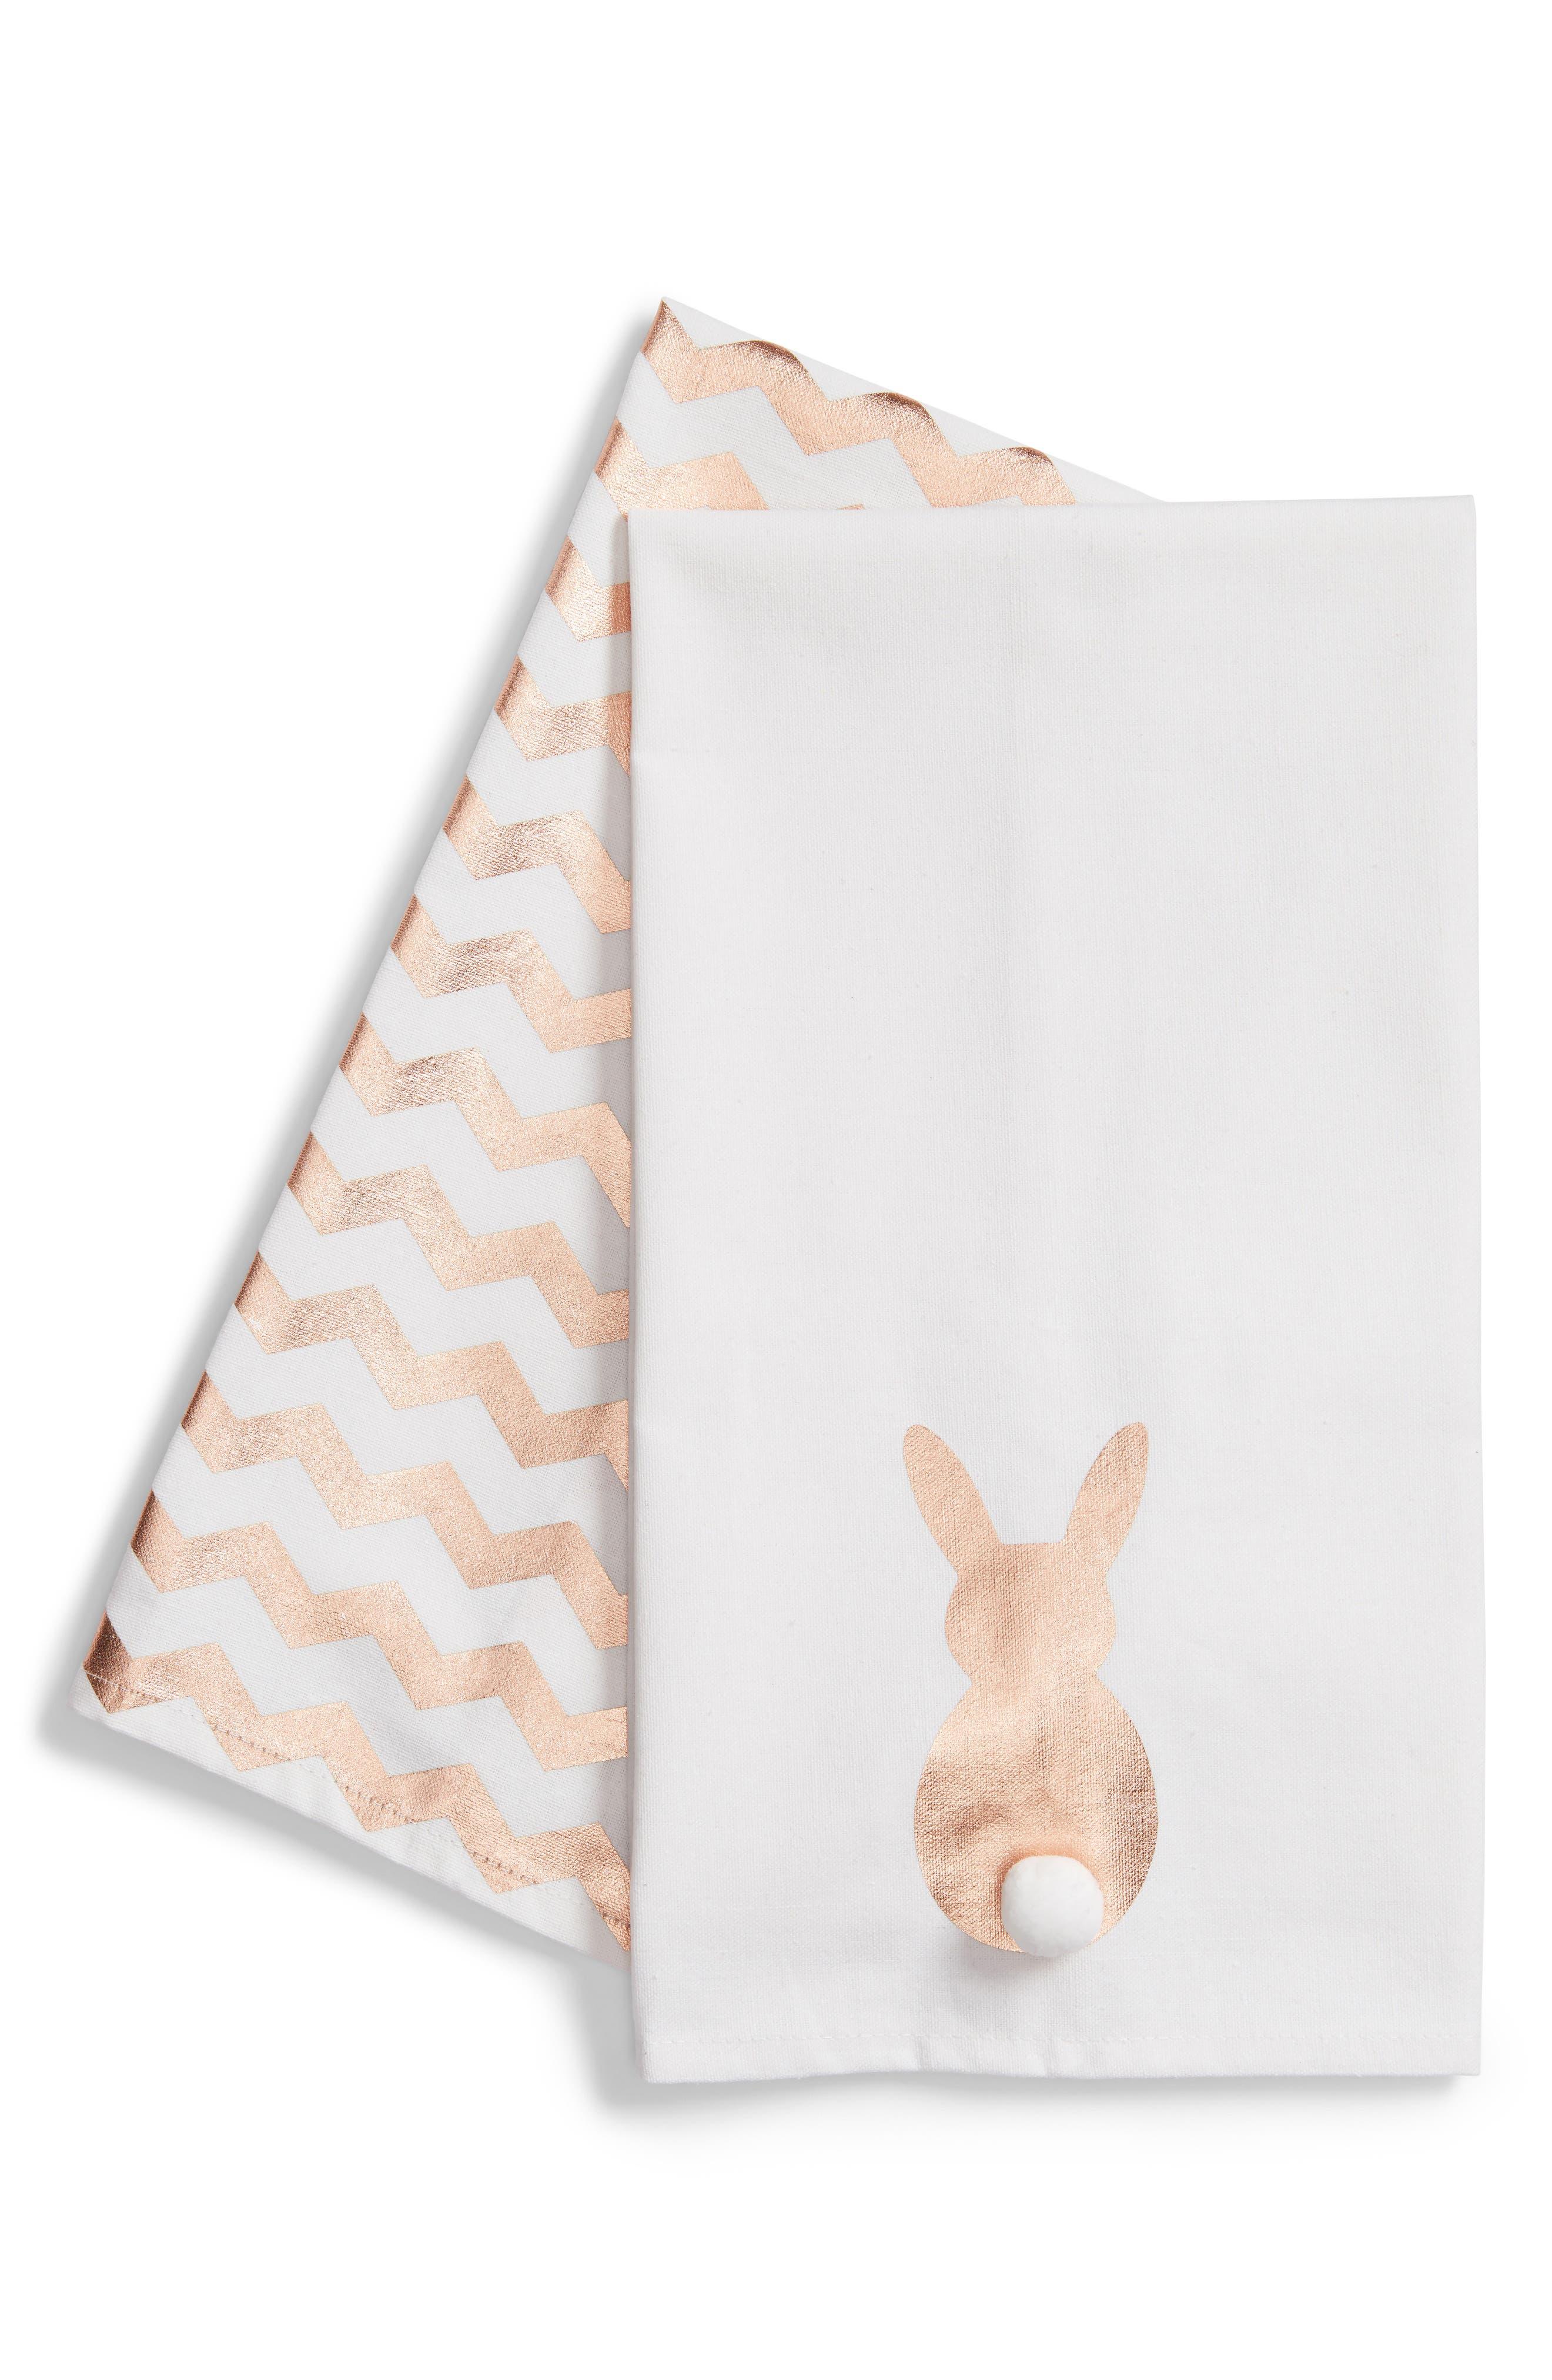 Bunny Set of 2 Dishtowels,                             Main thumbnail 1, color,                             Gold